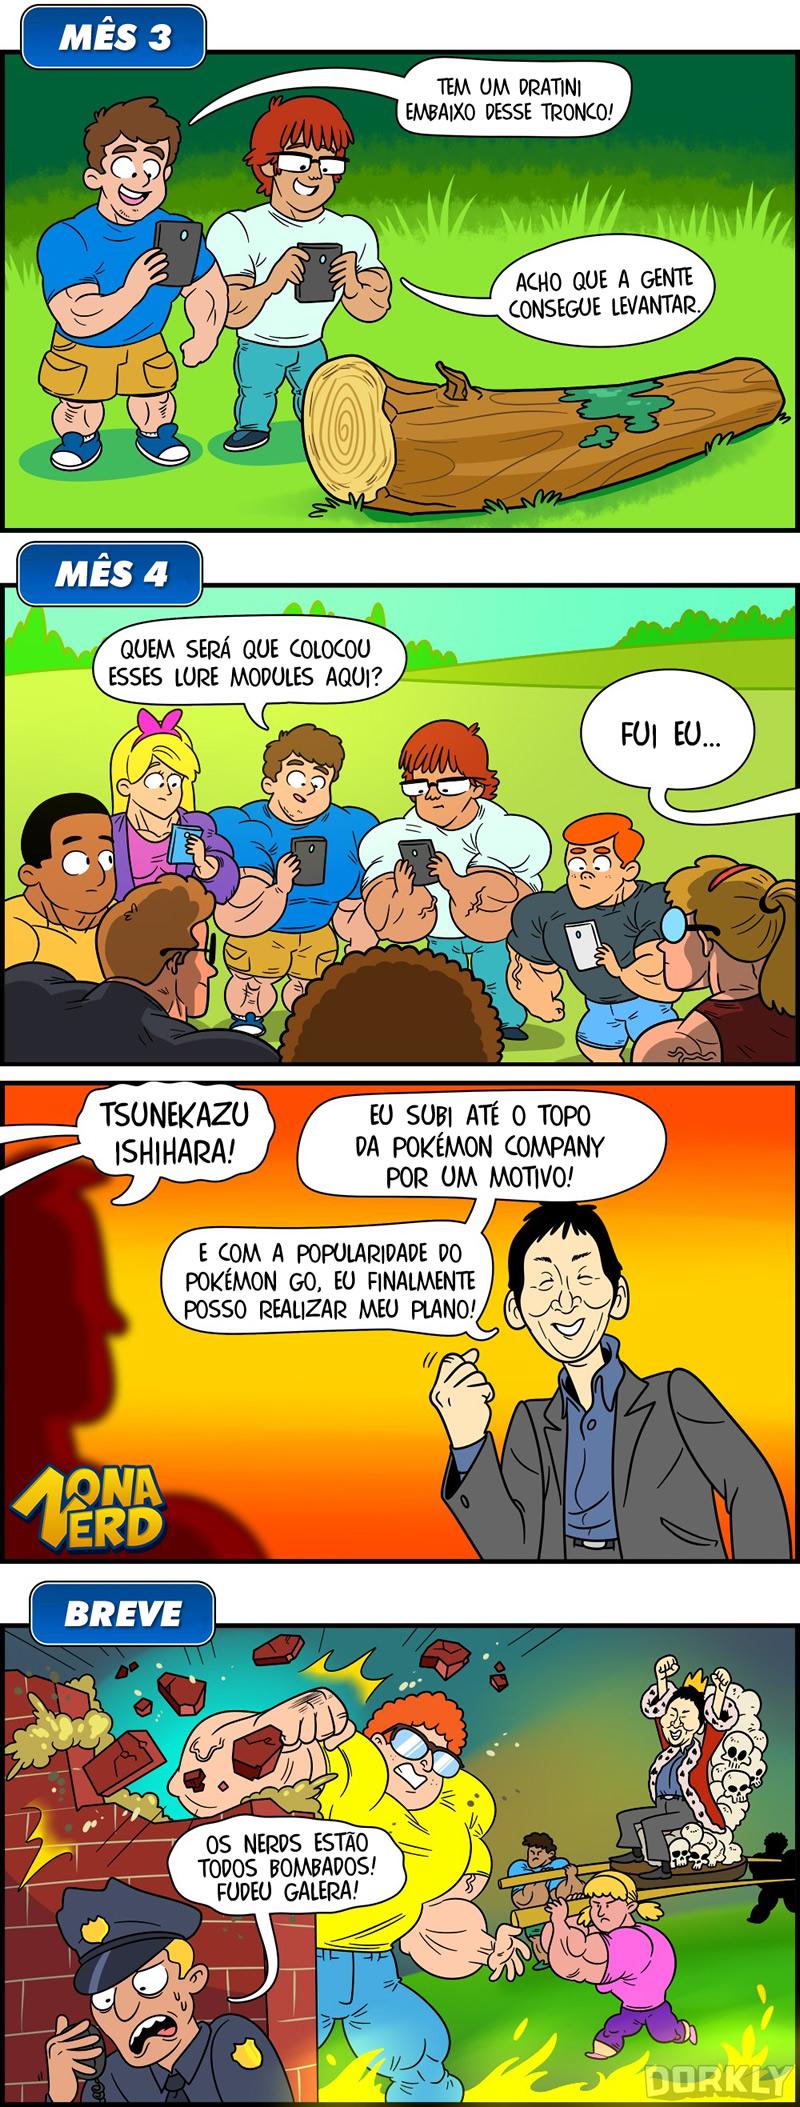 verdade pokemon go 2